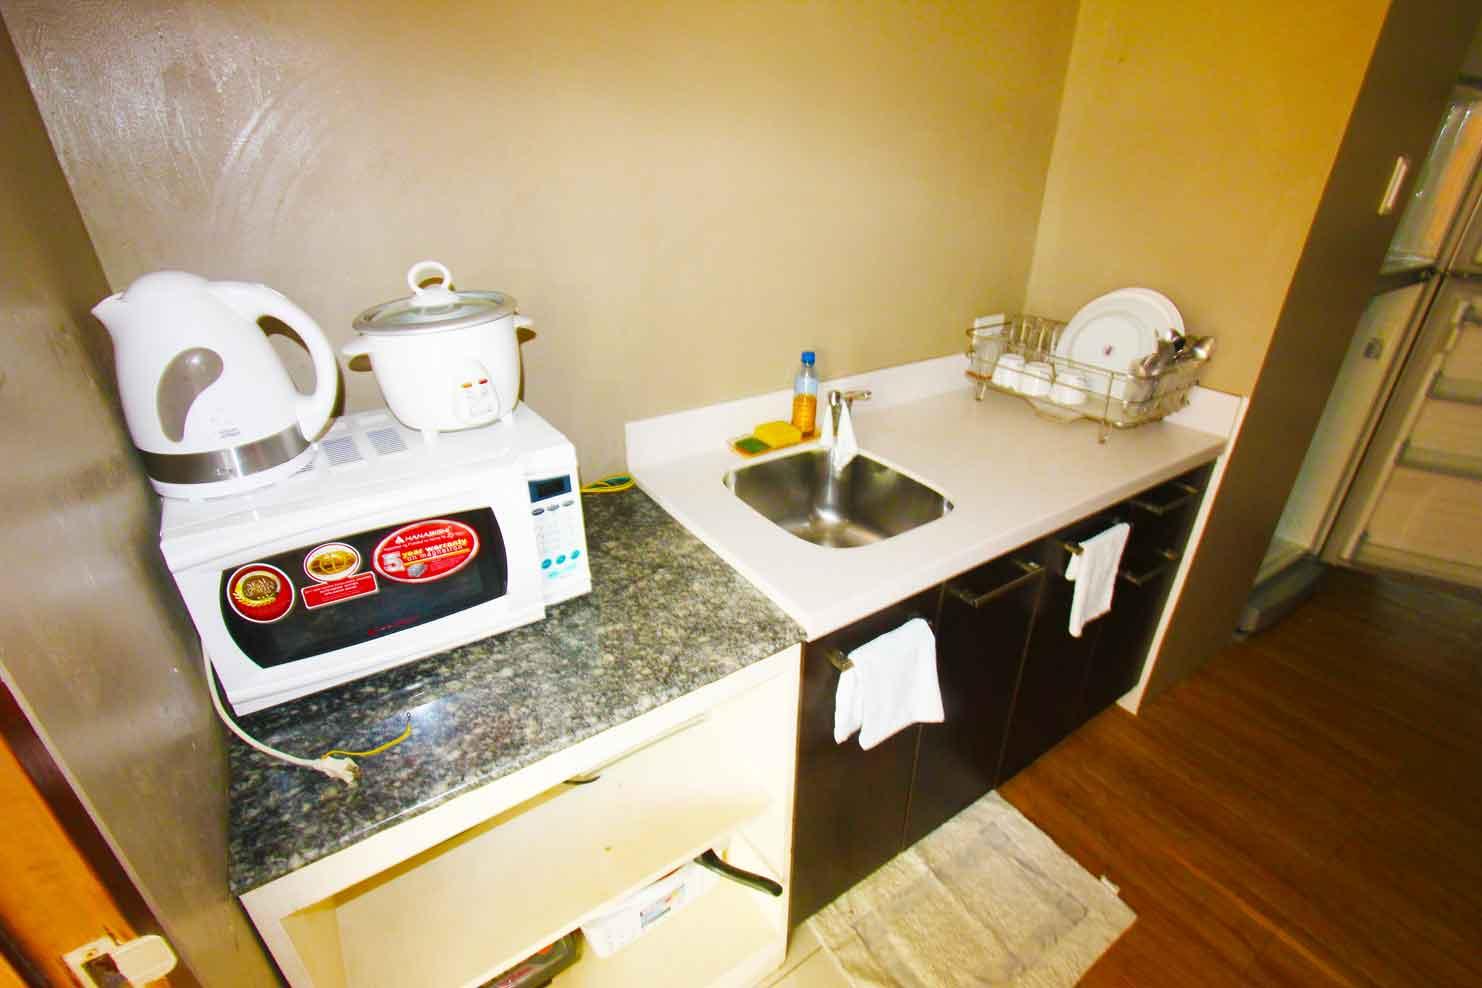 Hamilo Sample Images - myn kitchen 1280 low.